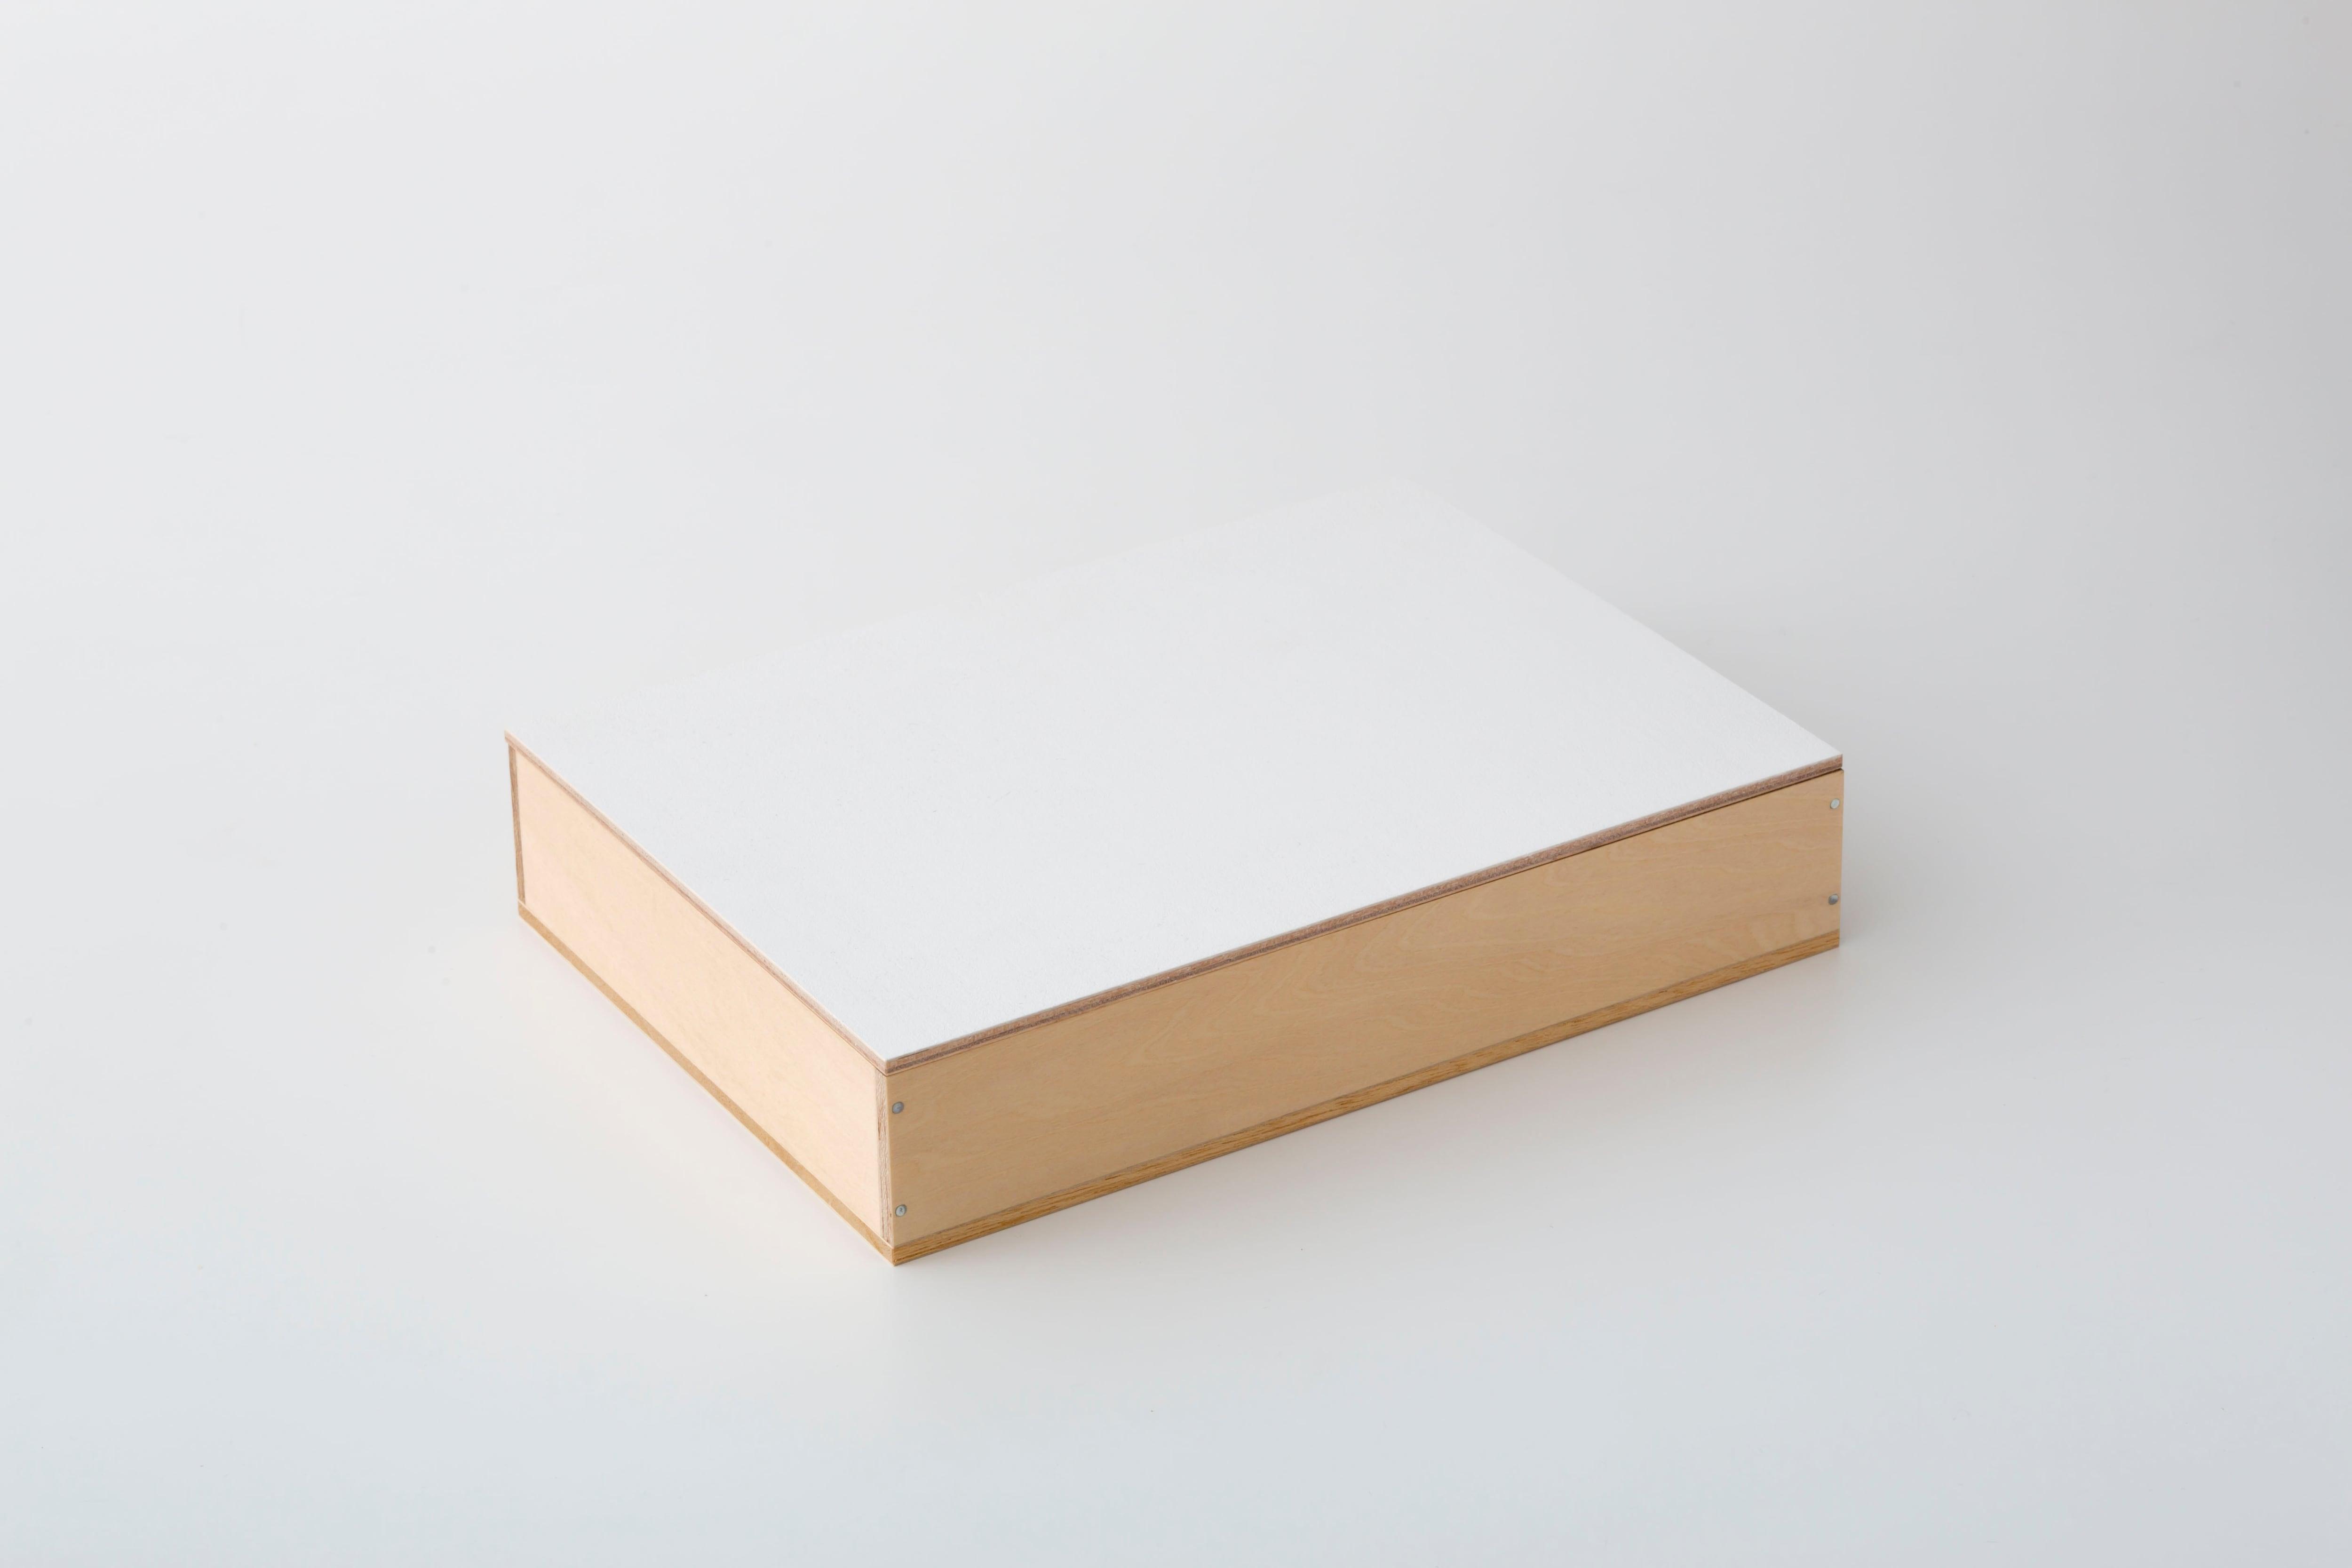 B5ボックス / 西本良太